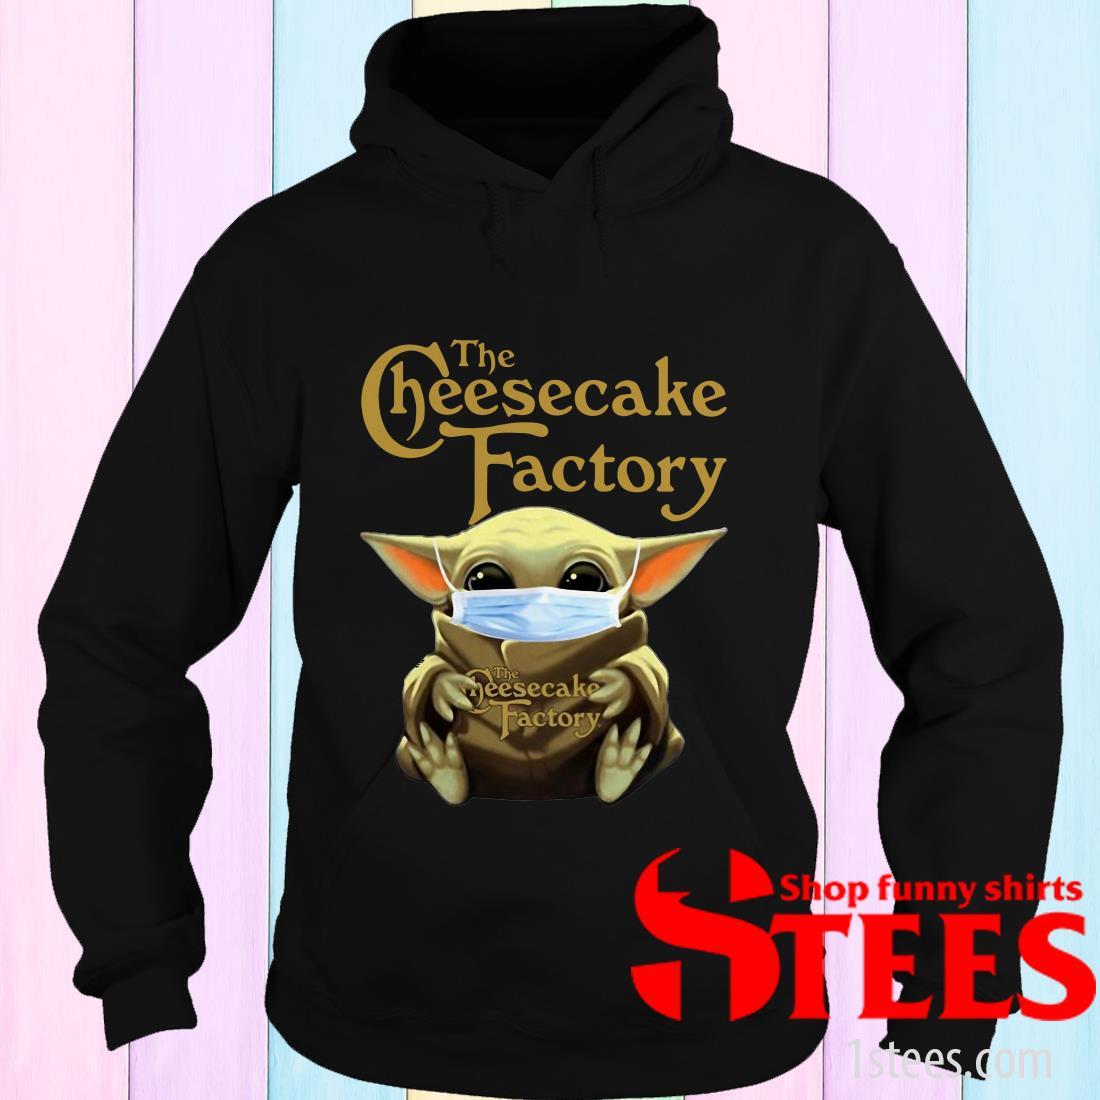 Star Wars Baby Yoda Hug The Cheesecake Factory Covid-19 Hoodies